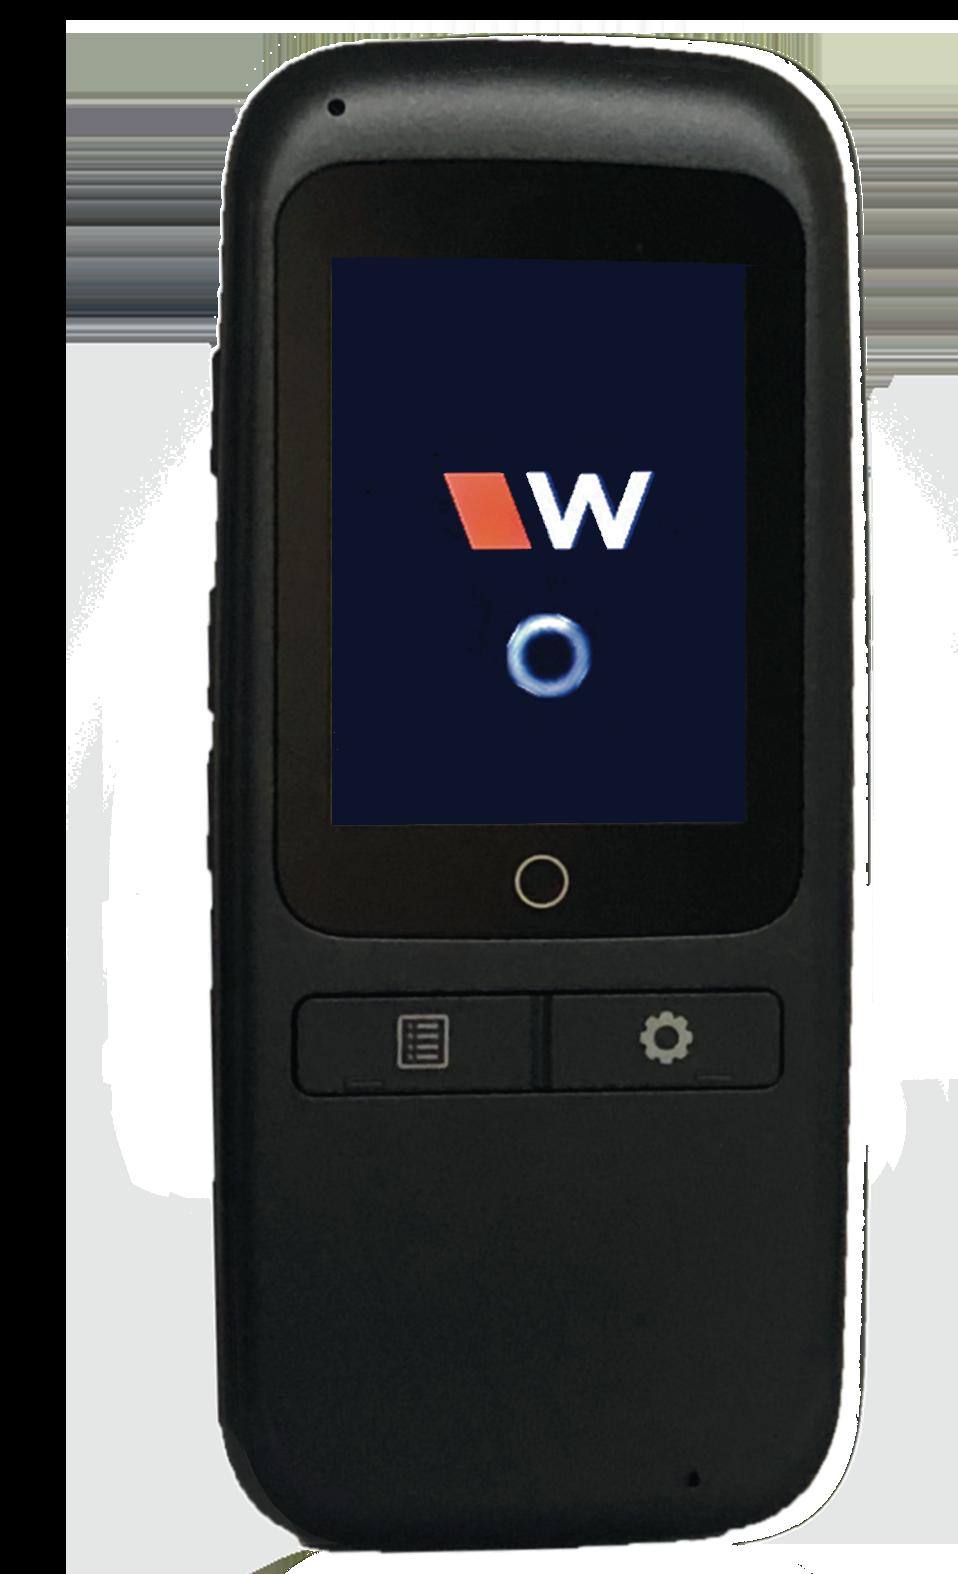 W-WF R1N WaveCAST Wi-Fi receiver